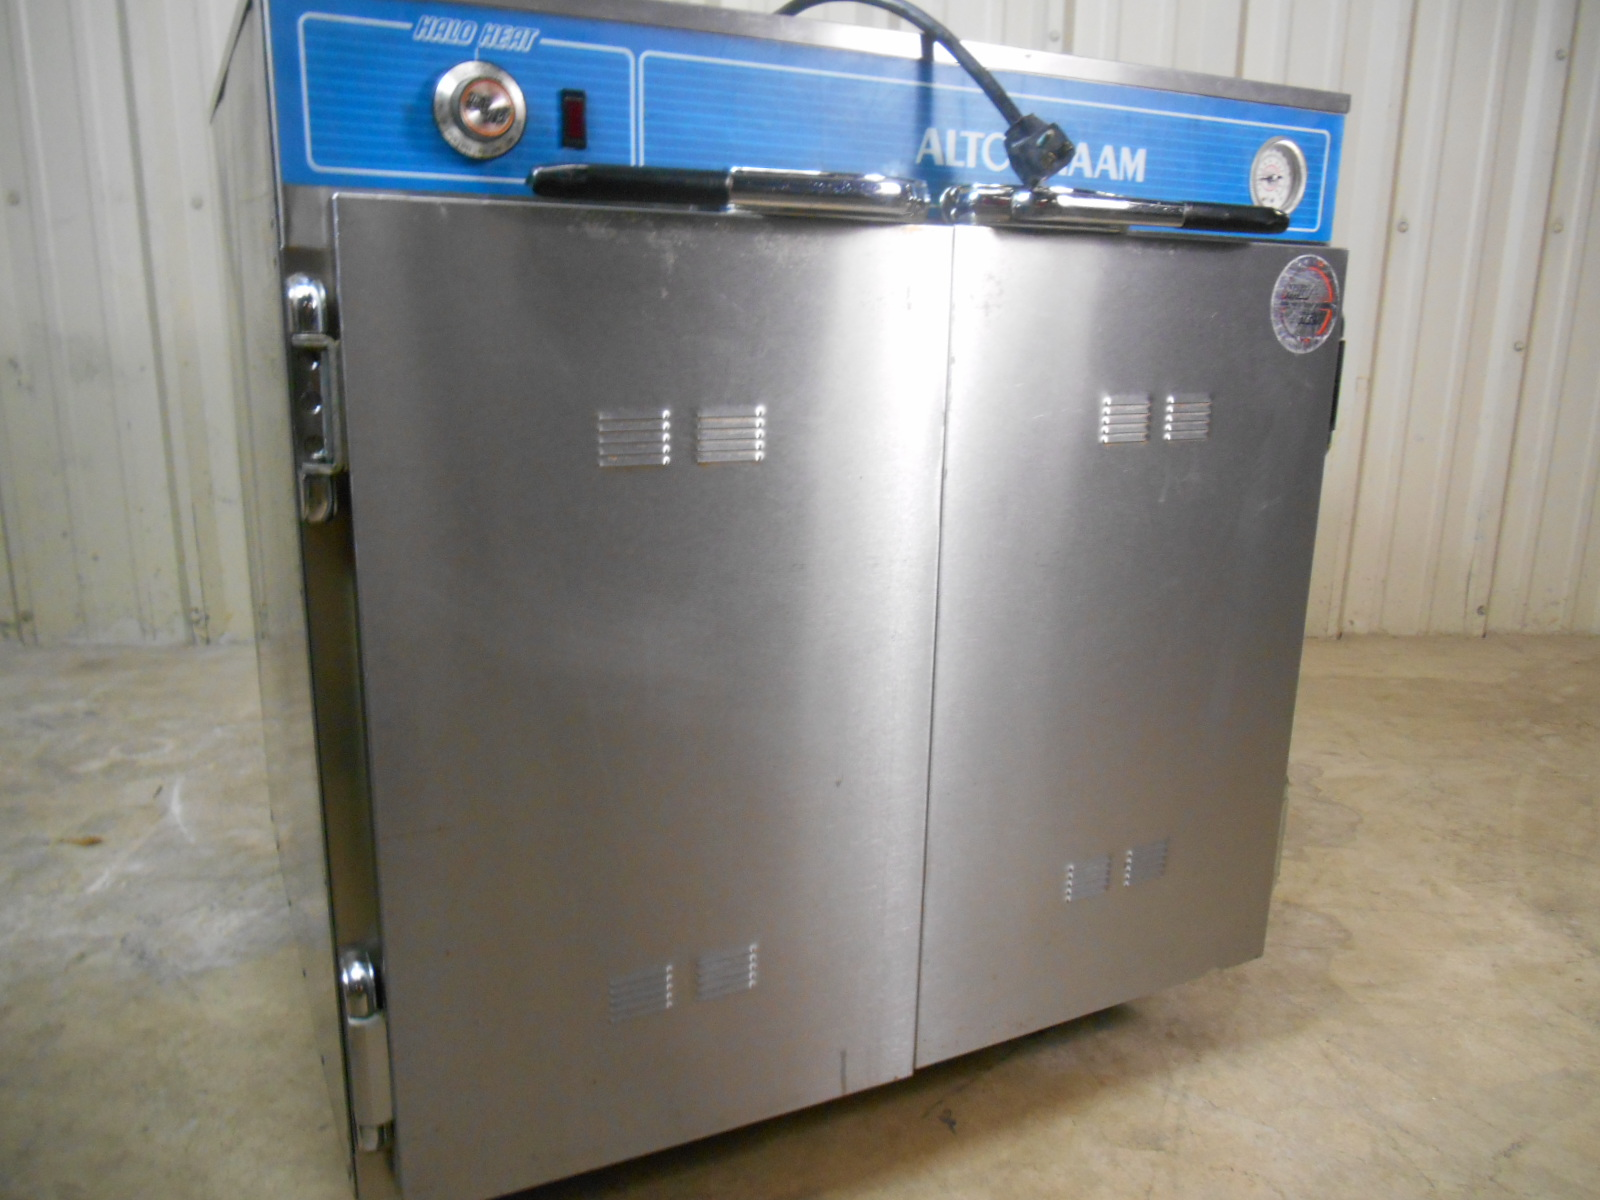 AltoShaam Hot Food Holding Cabinet Used, Tested Good